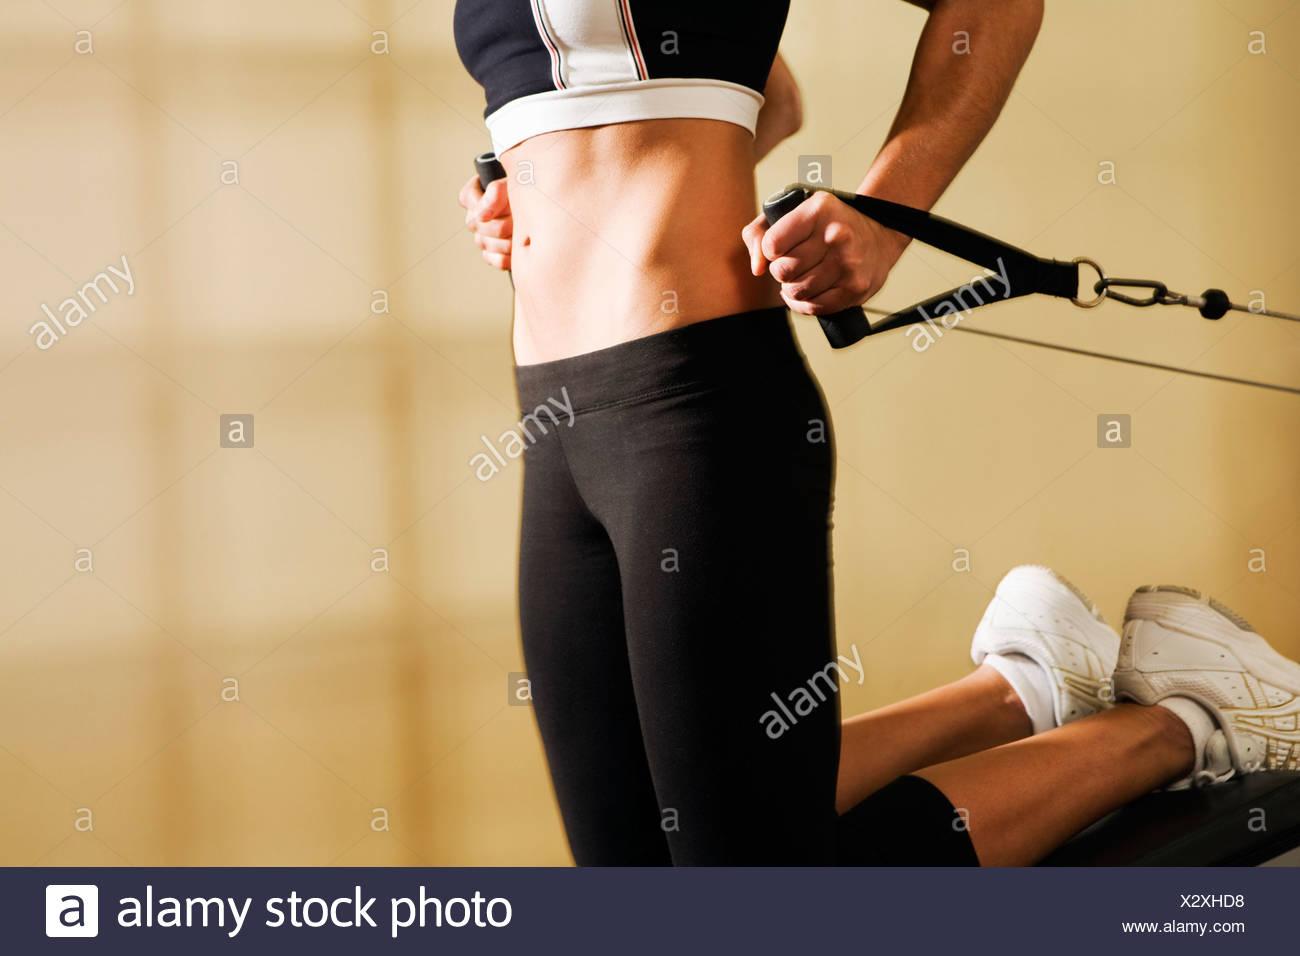 Torso Schuss von junge Frau Training im Fitness-Studio Stockbild